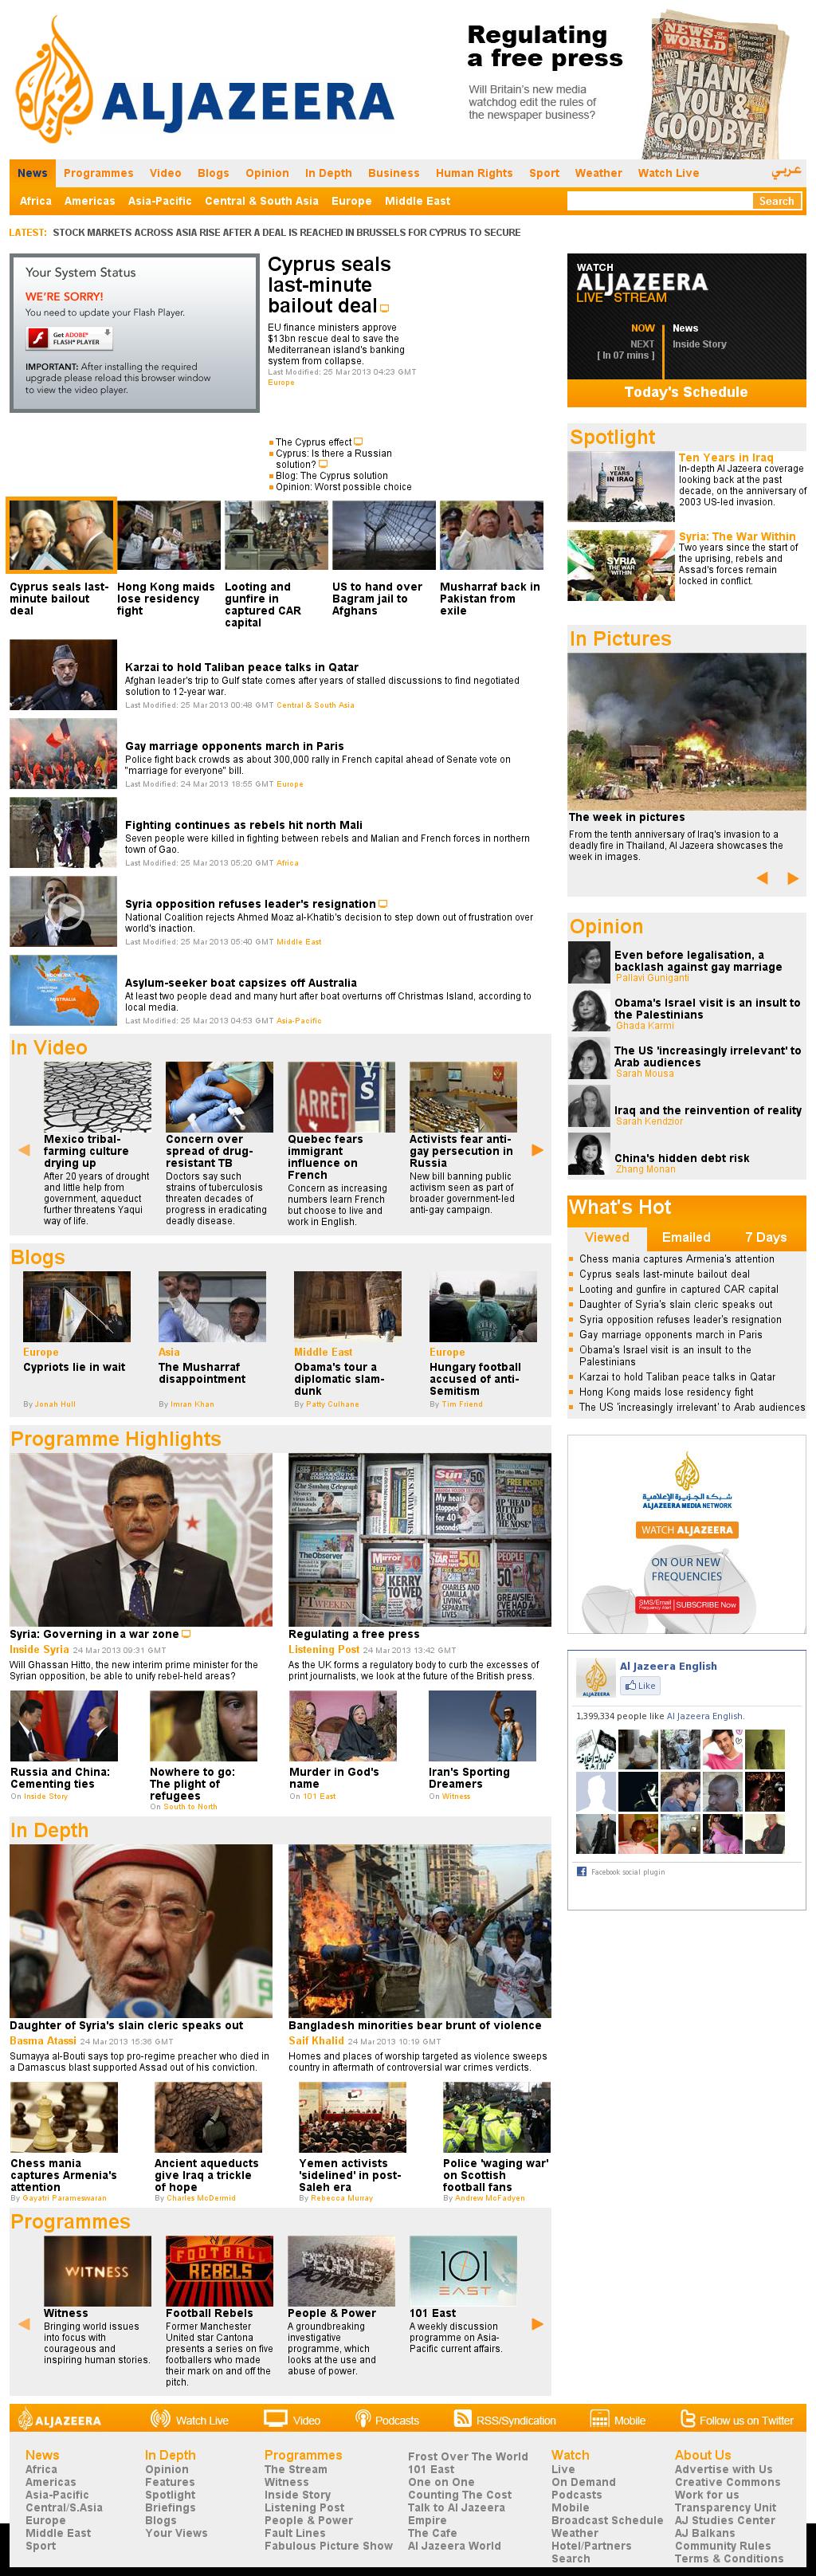 Al Jazeera (English) at Monday March 25, 2013, 7:20 a.m. UTC